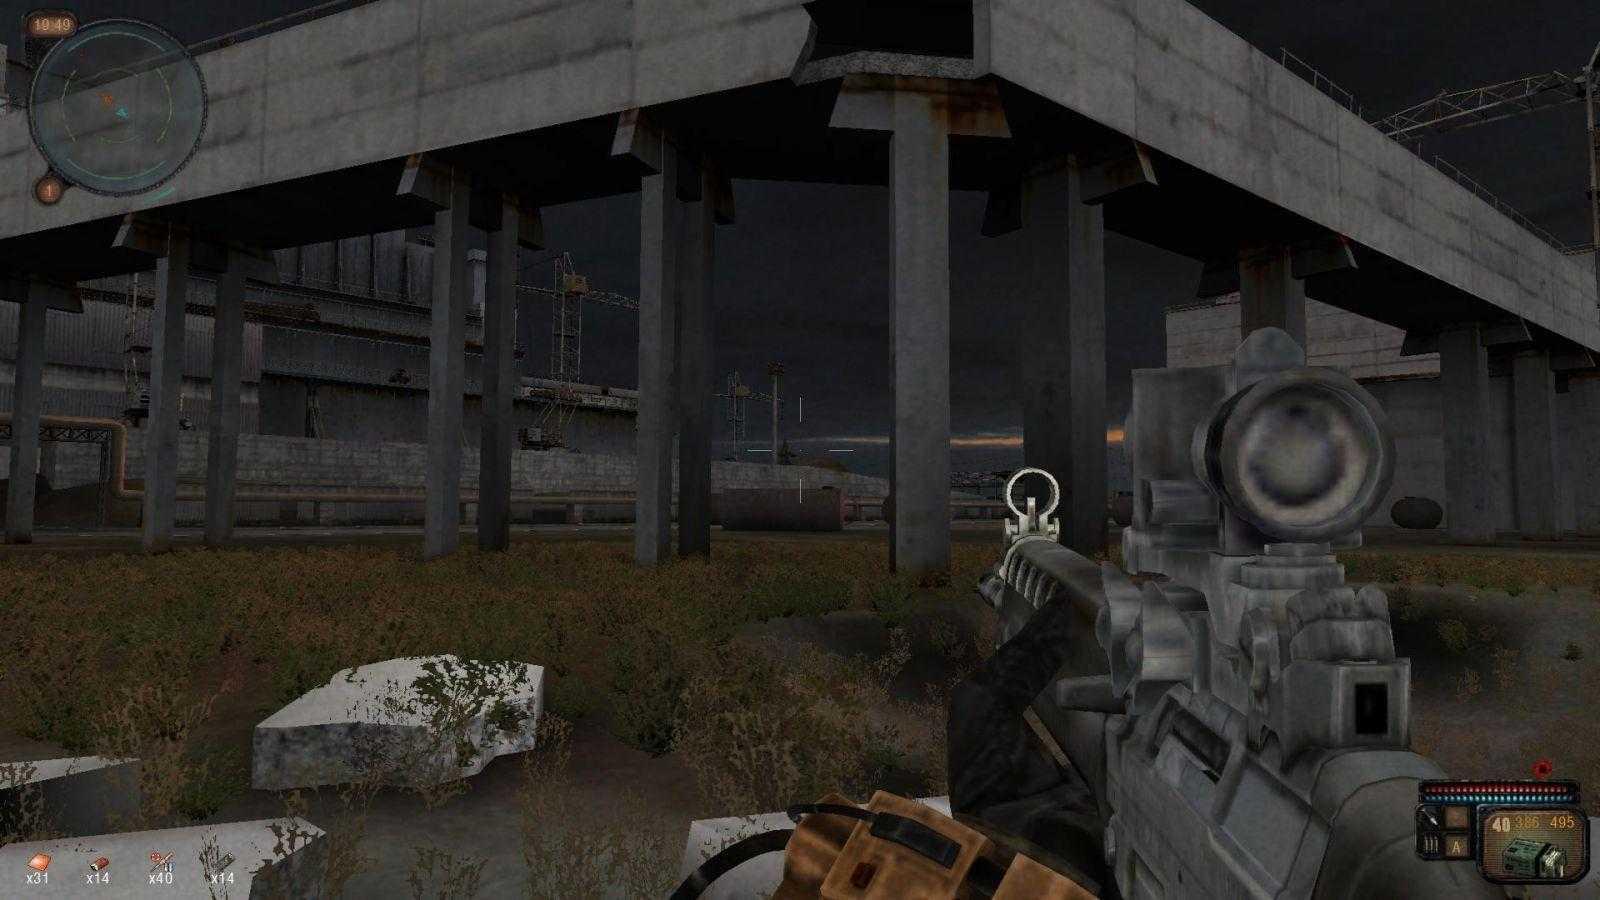 Гайд по S.T.A.L.K.E.R. Call of Chernobyl (ss brain 08 19 15 20 21 24 l12 stancia 2)